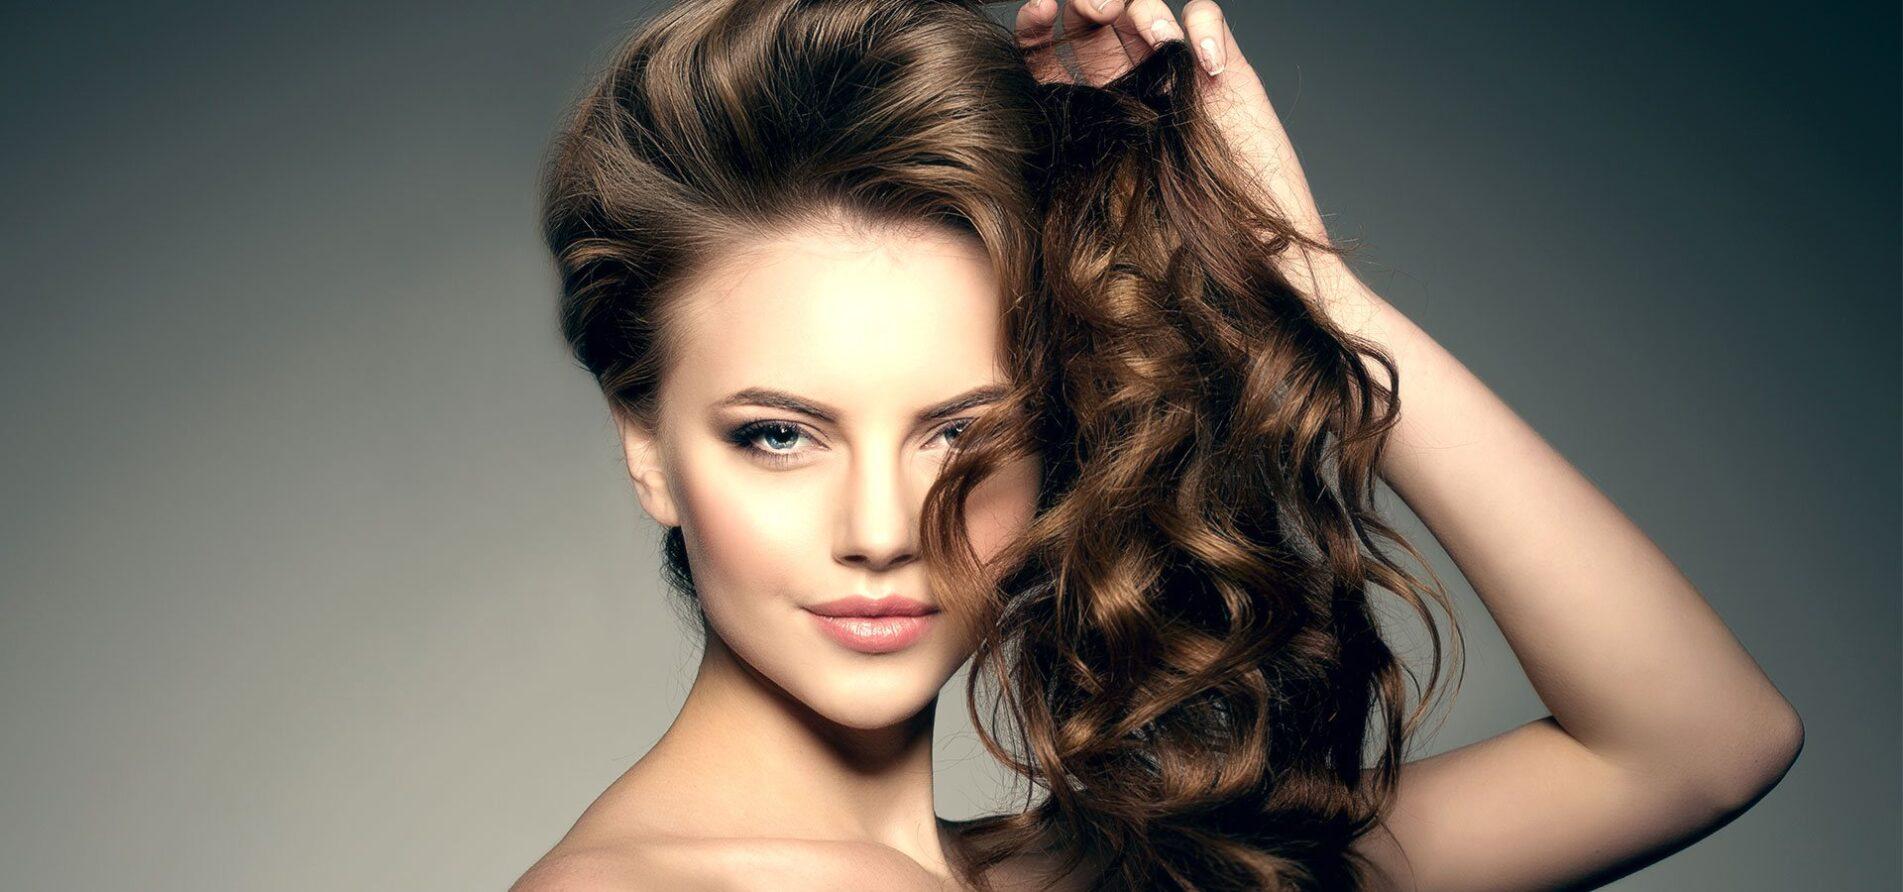 Do Hair Extensions Ruin Your Hair